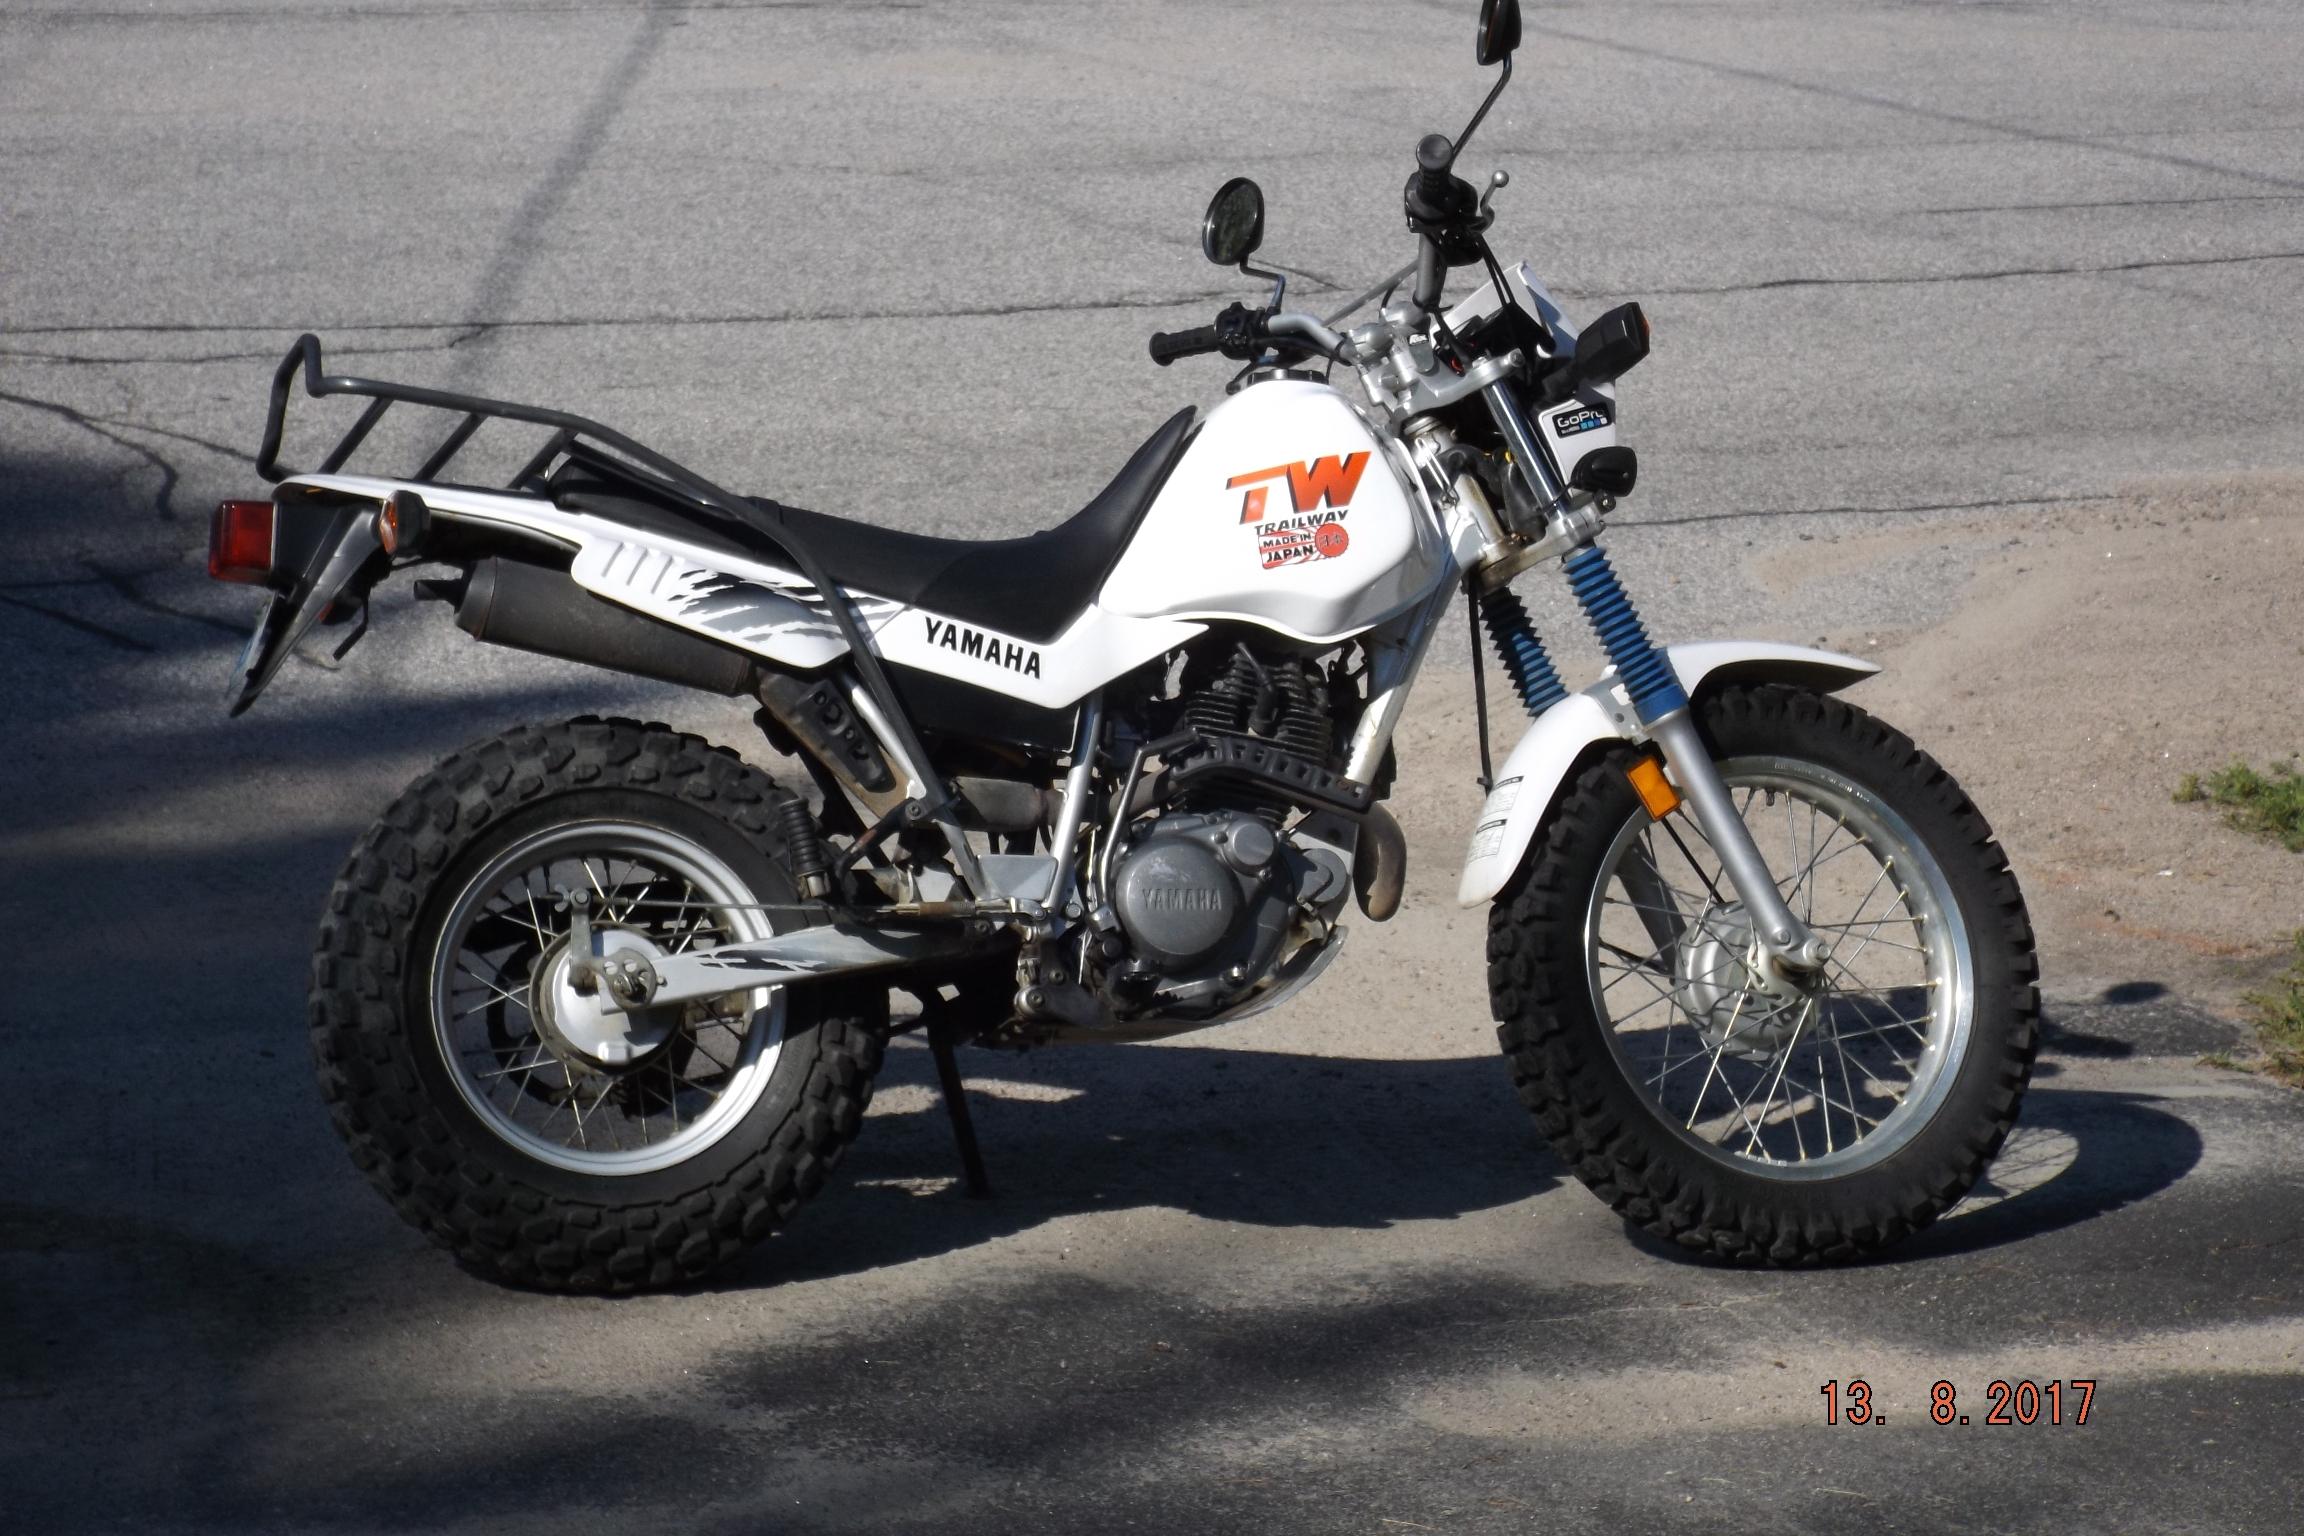 Yamaha TW200 Trail Way Trailway Motorcycle Custom Funny Decal Sticker